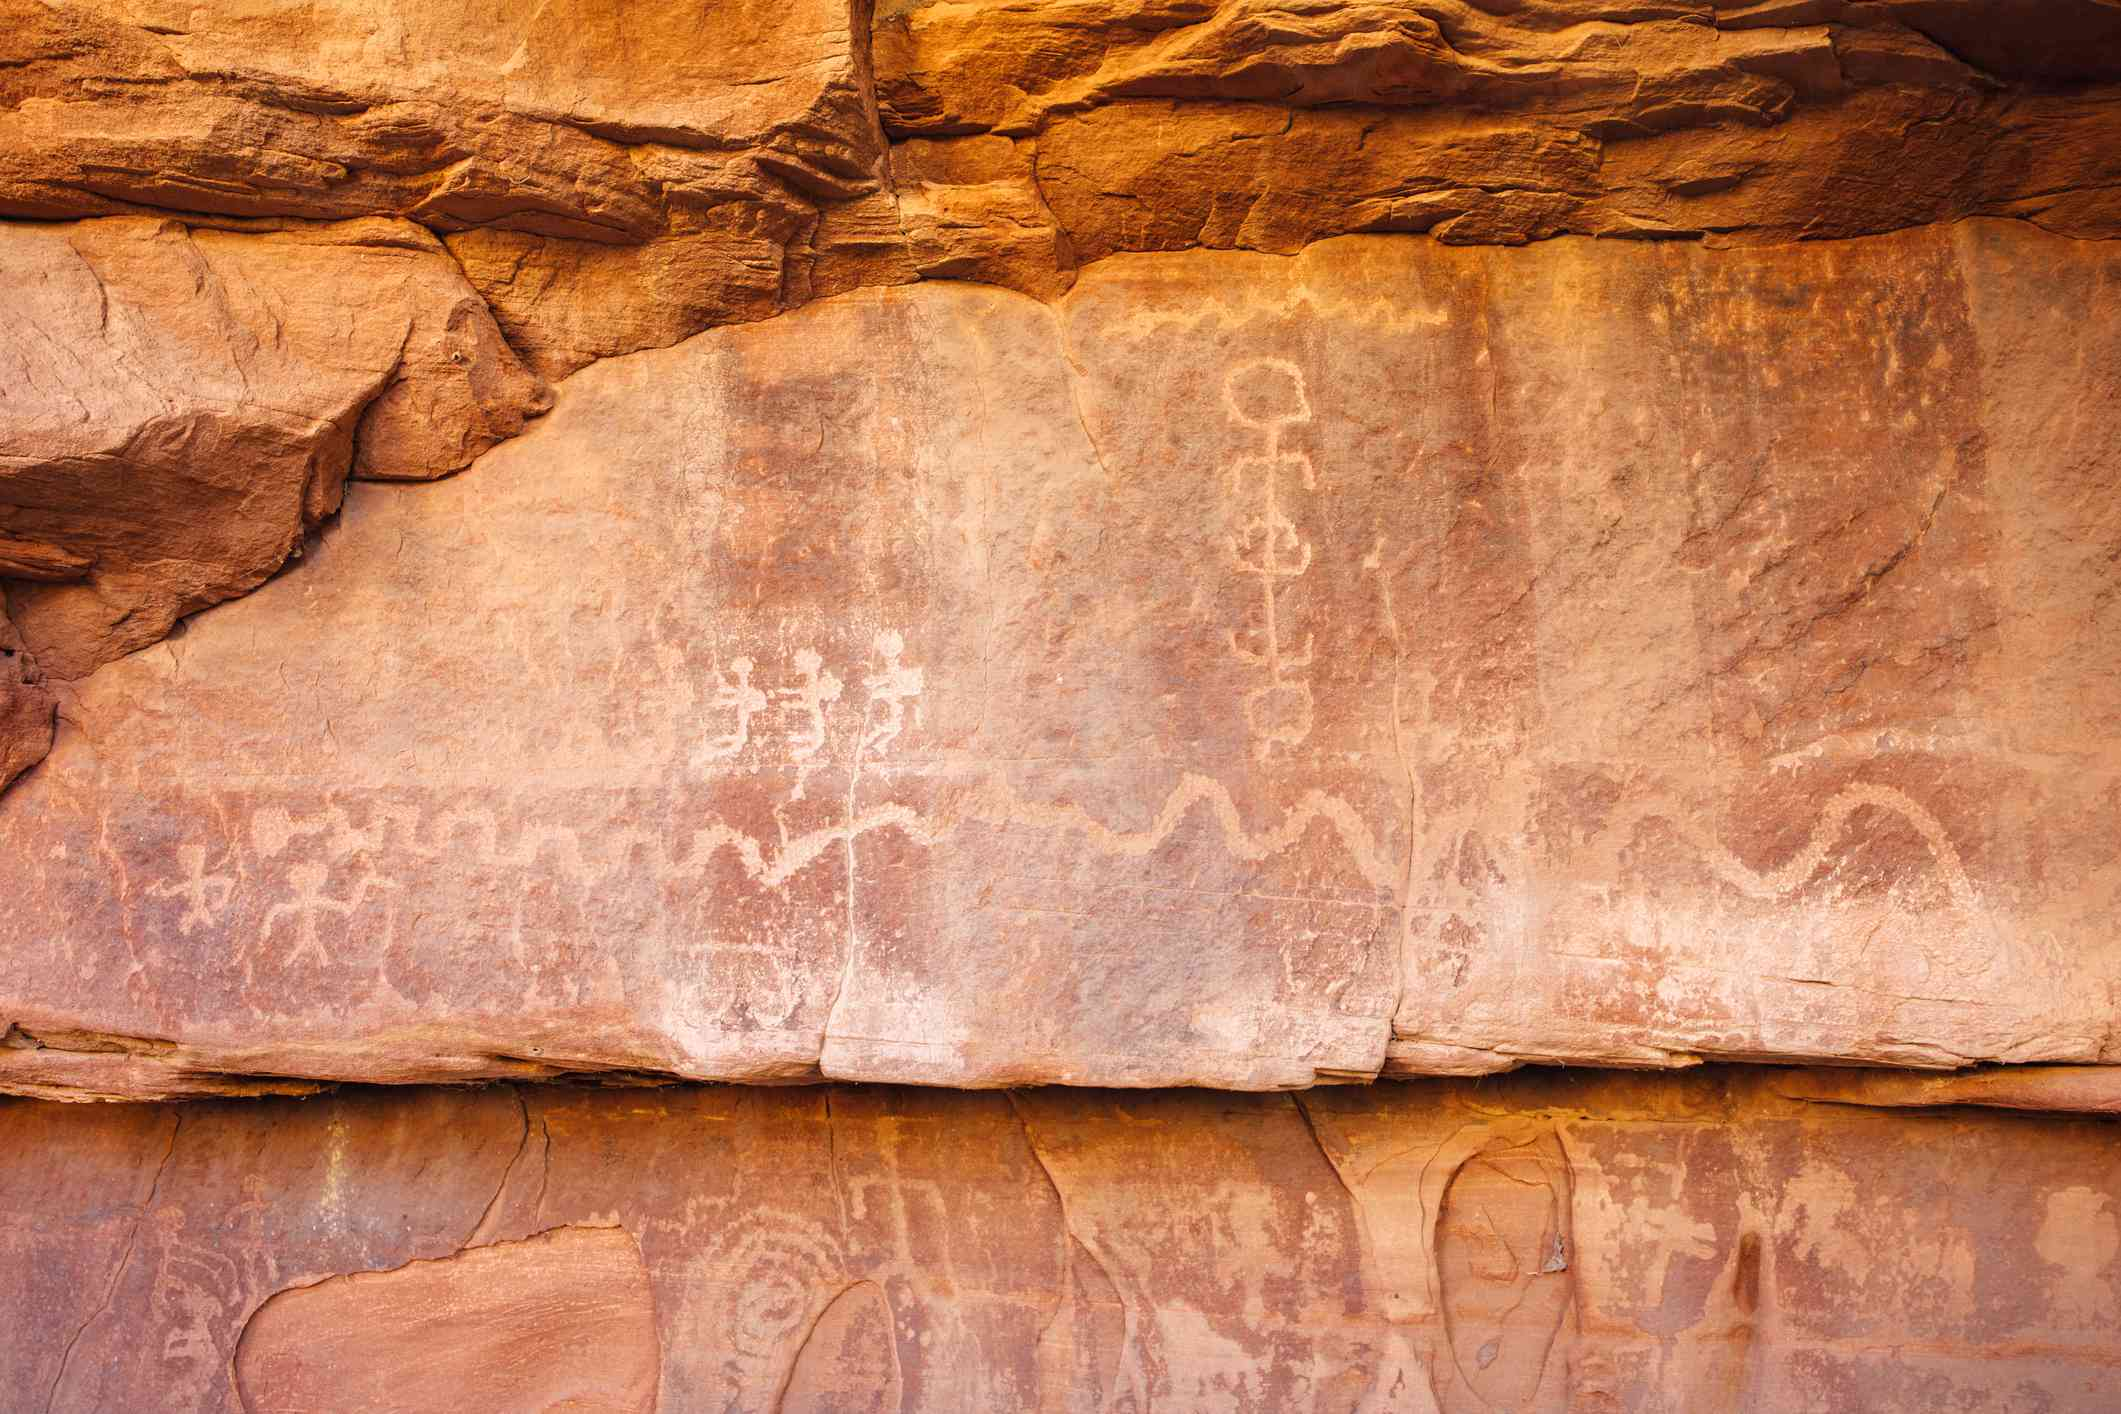 Petroglyphs in Zion National Park, Utah